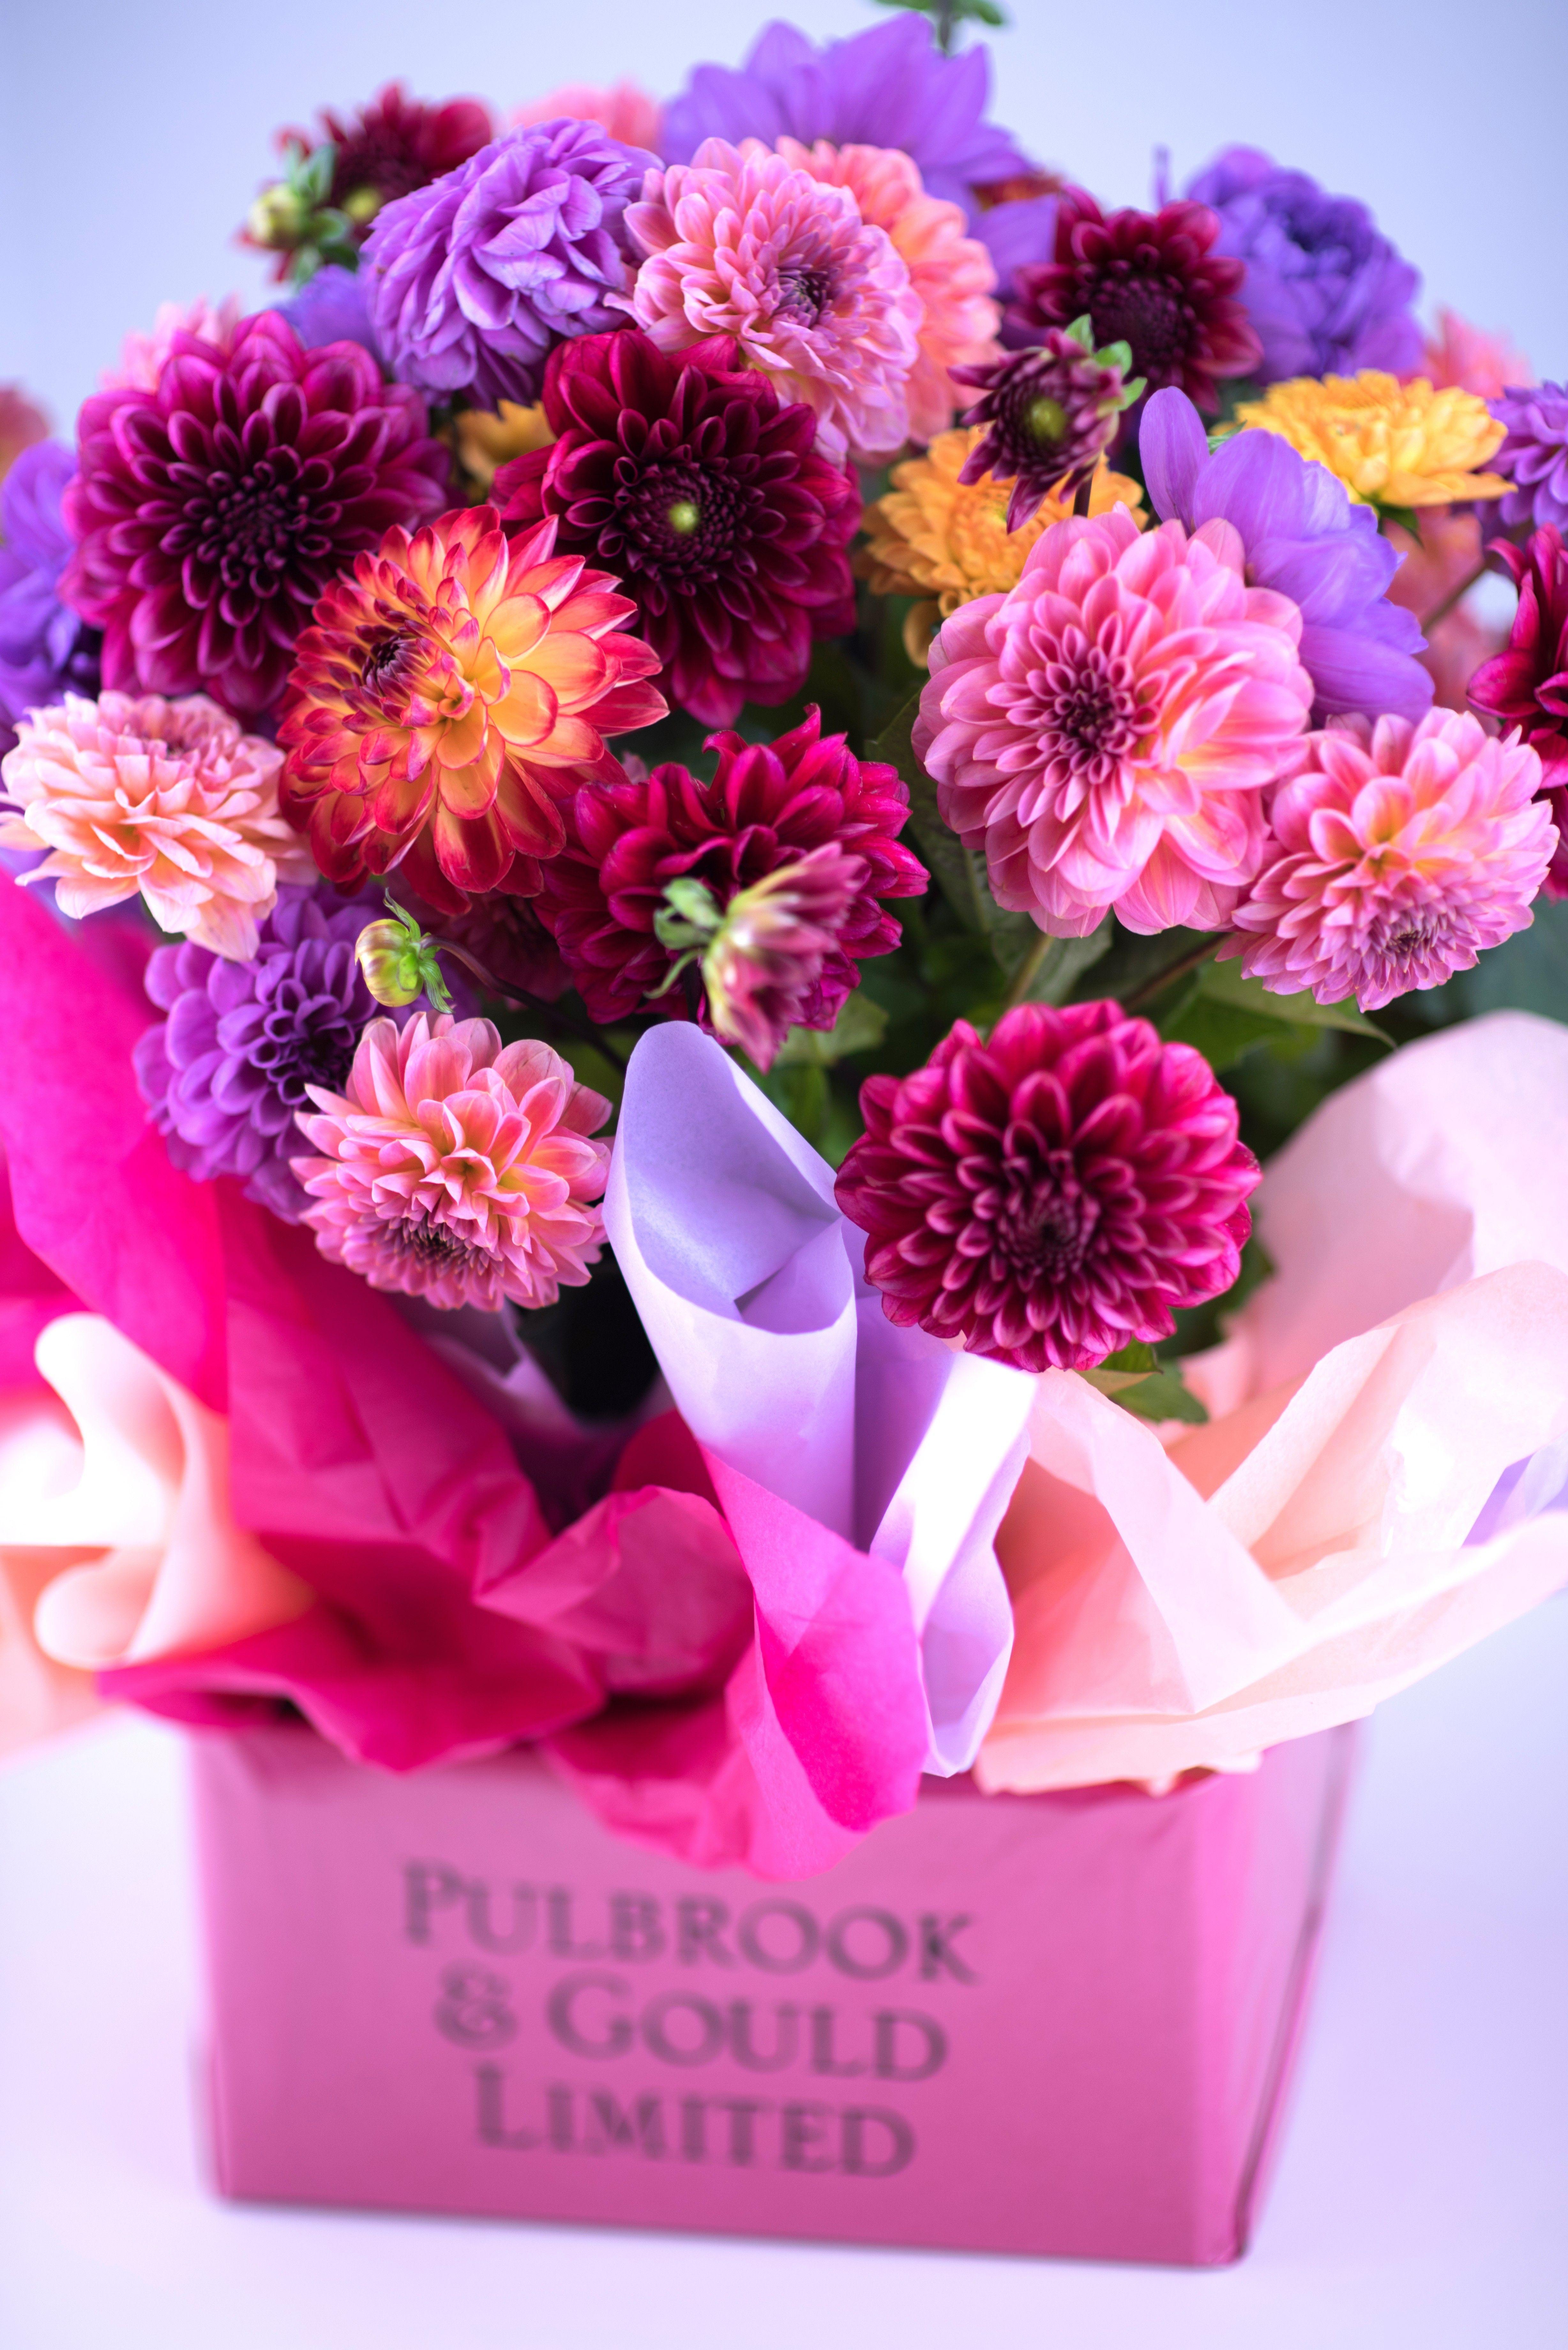 Mixed dahlias Pulbrook and Gould London florist